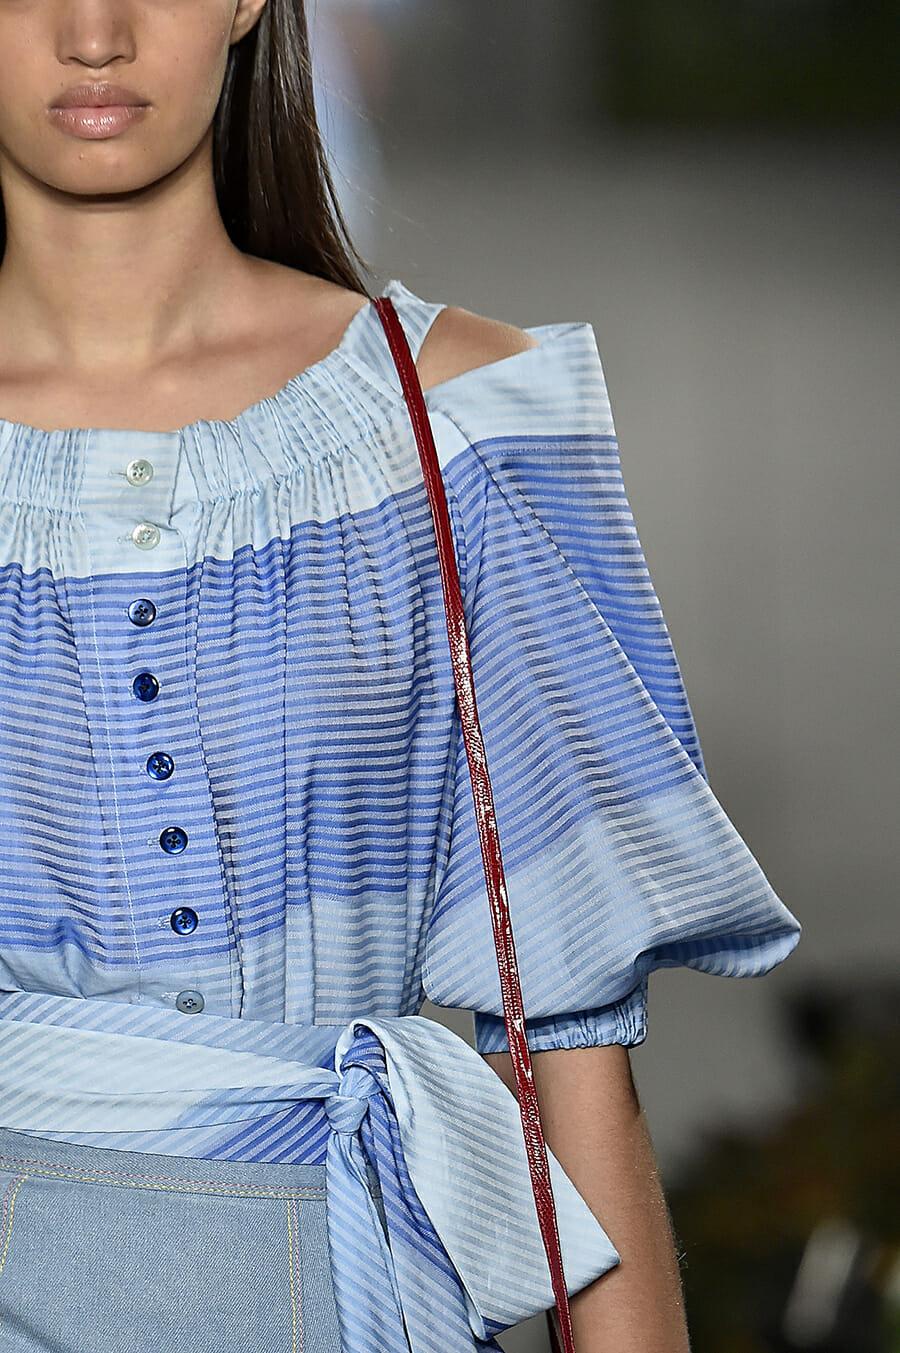 Carolina-Herrera-New-York-Fashion-Week-Spring-Summer-2018-NY-September-2017-look10-detail1